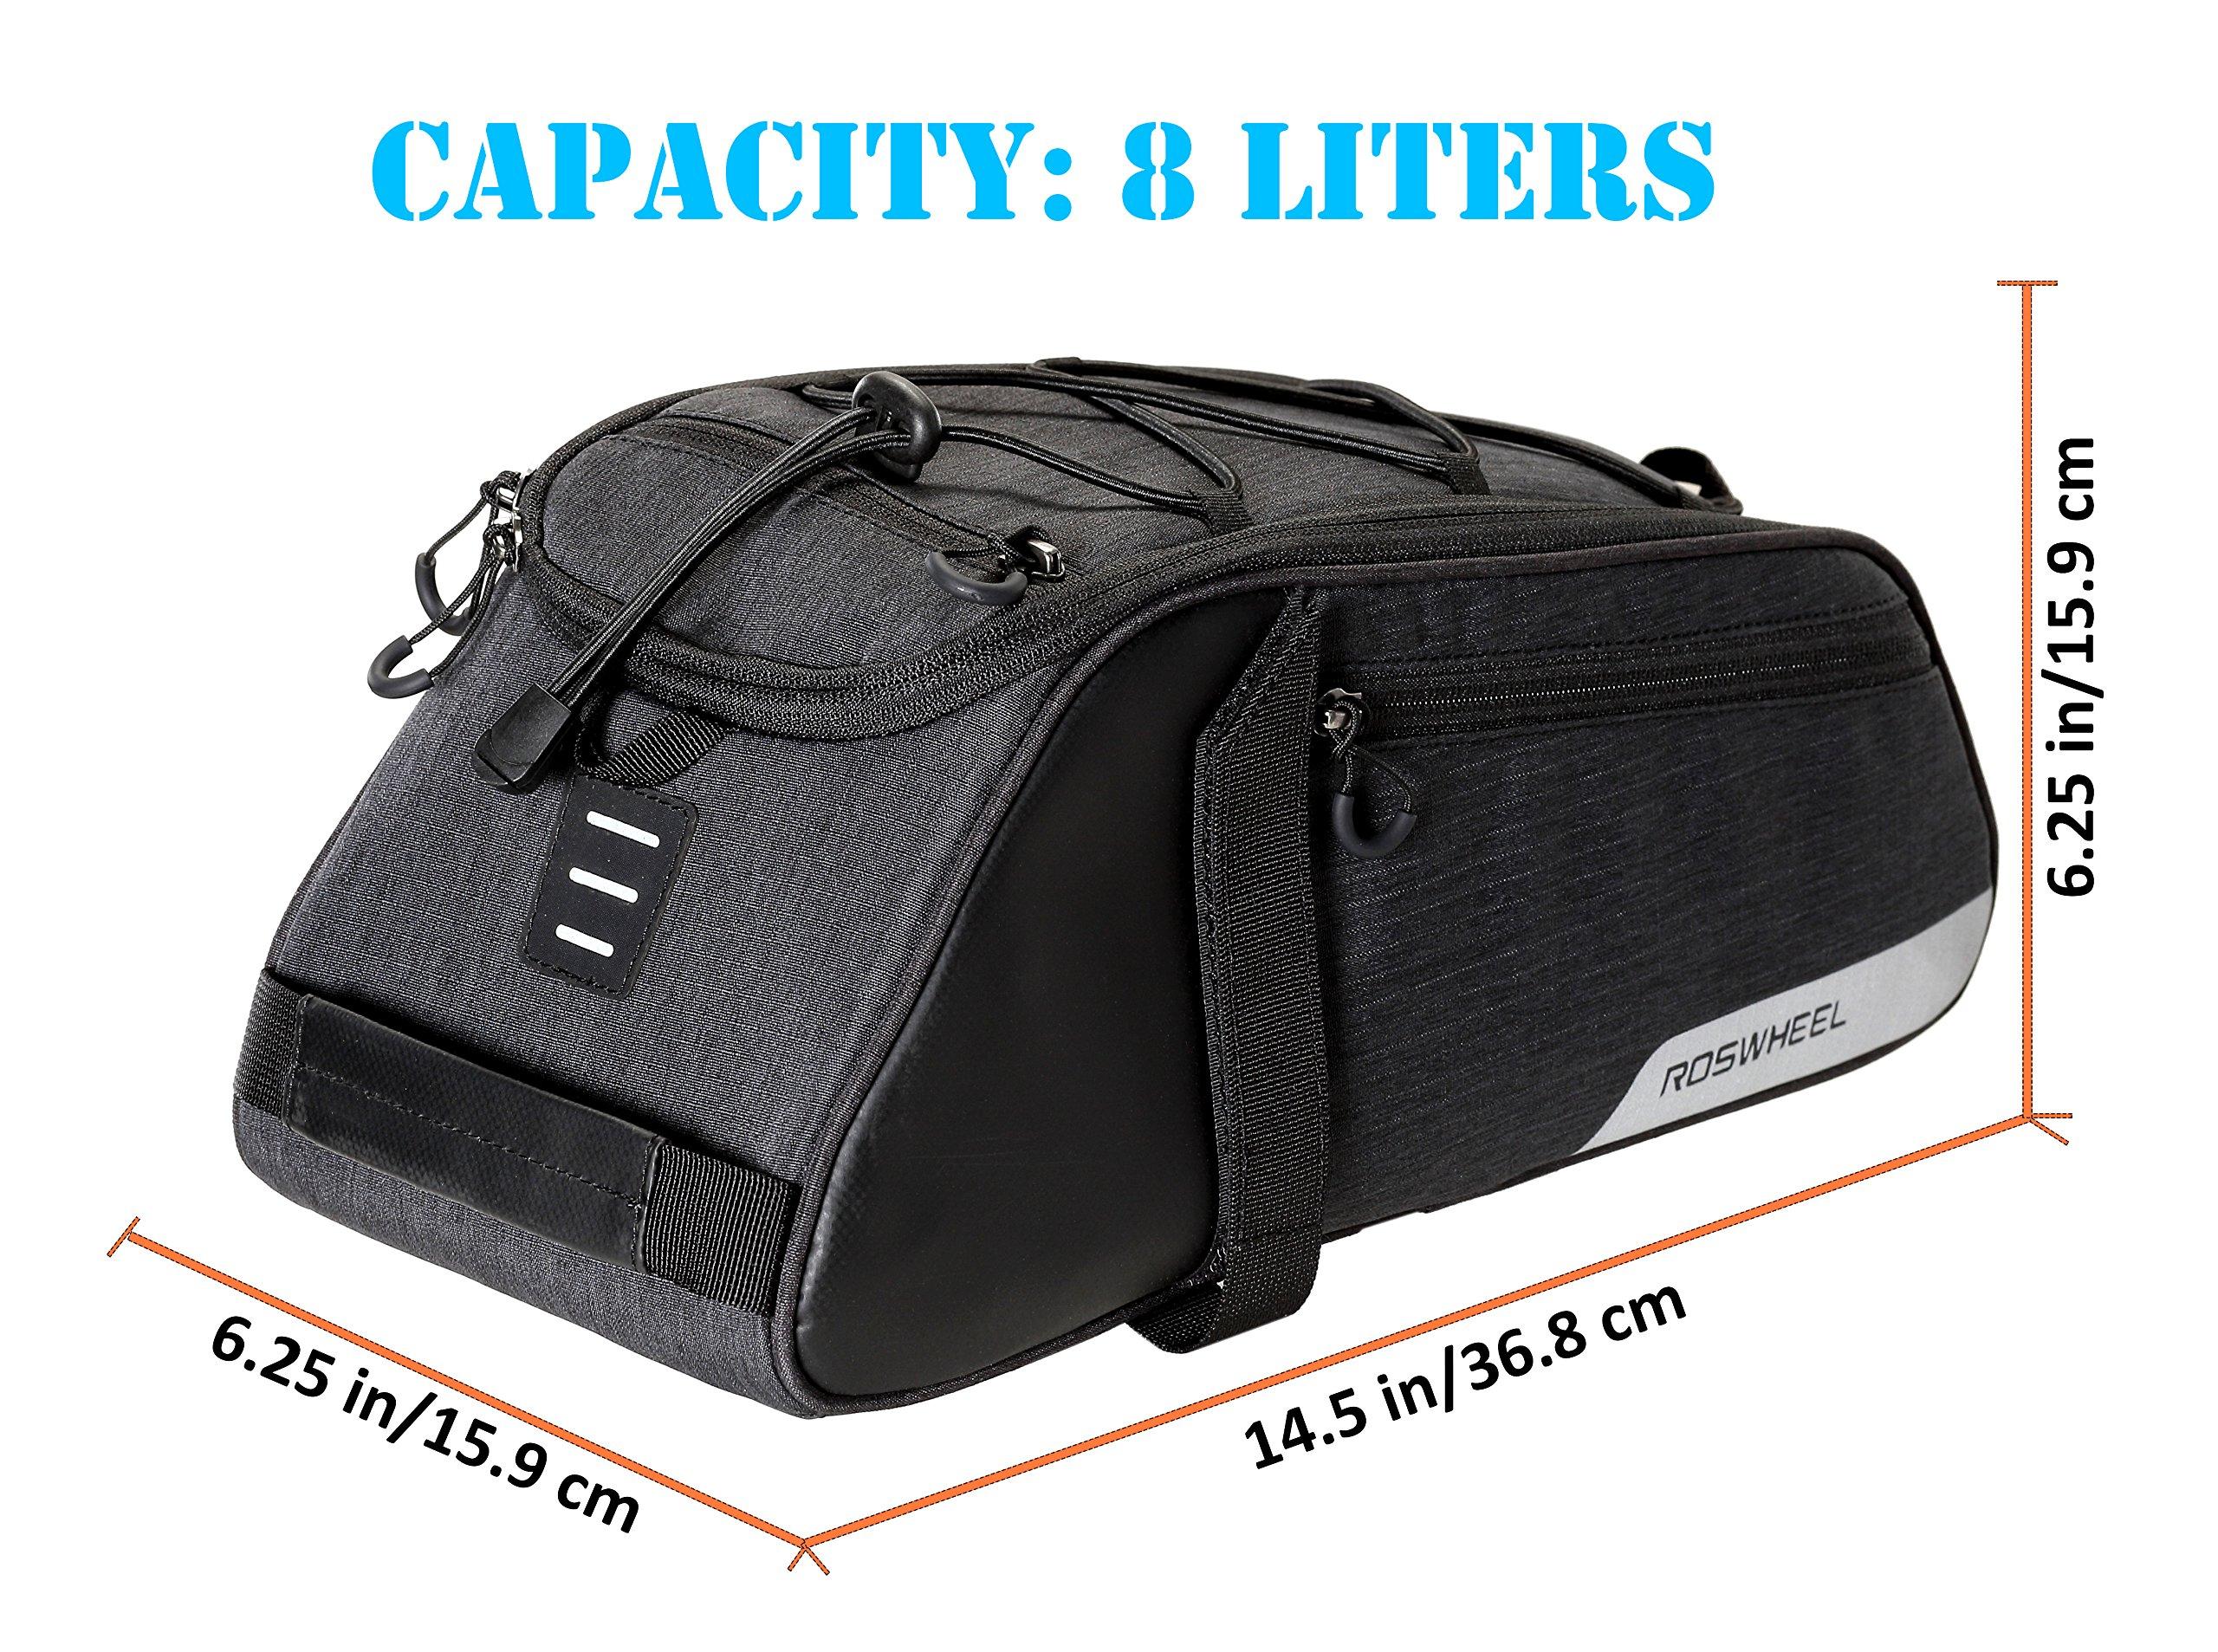 Roswheel Essentials Series 141466 Bike Trunk Bag Bicycle Rear Rack Pack Cycling Accessories Pannier, 8L Capacity by Roswheel (Image #6)